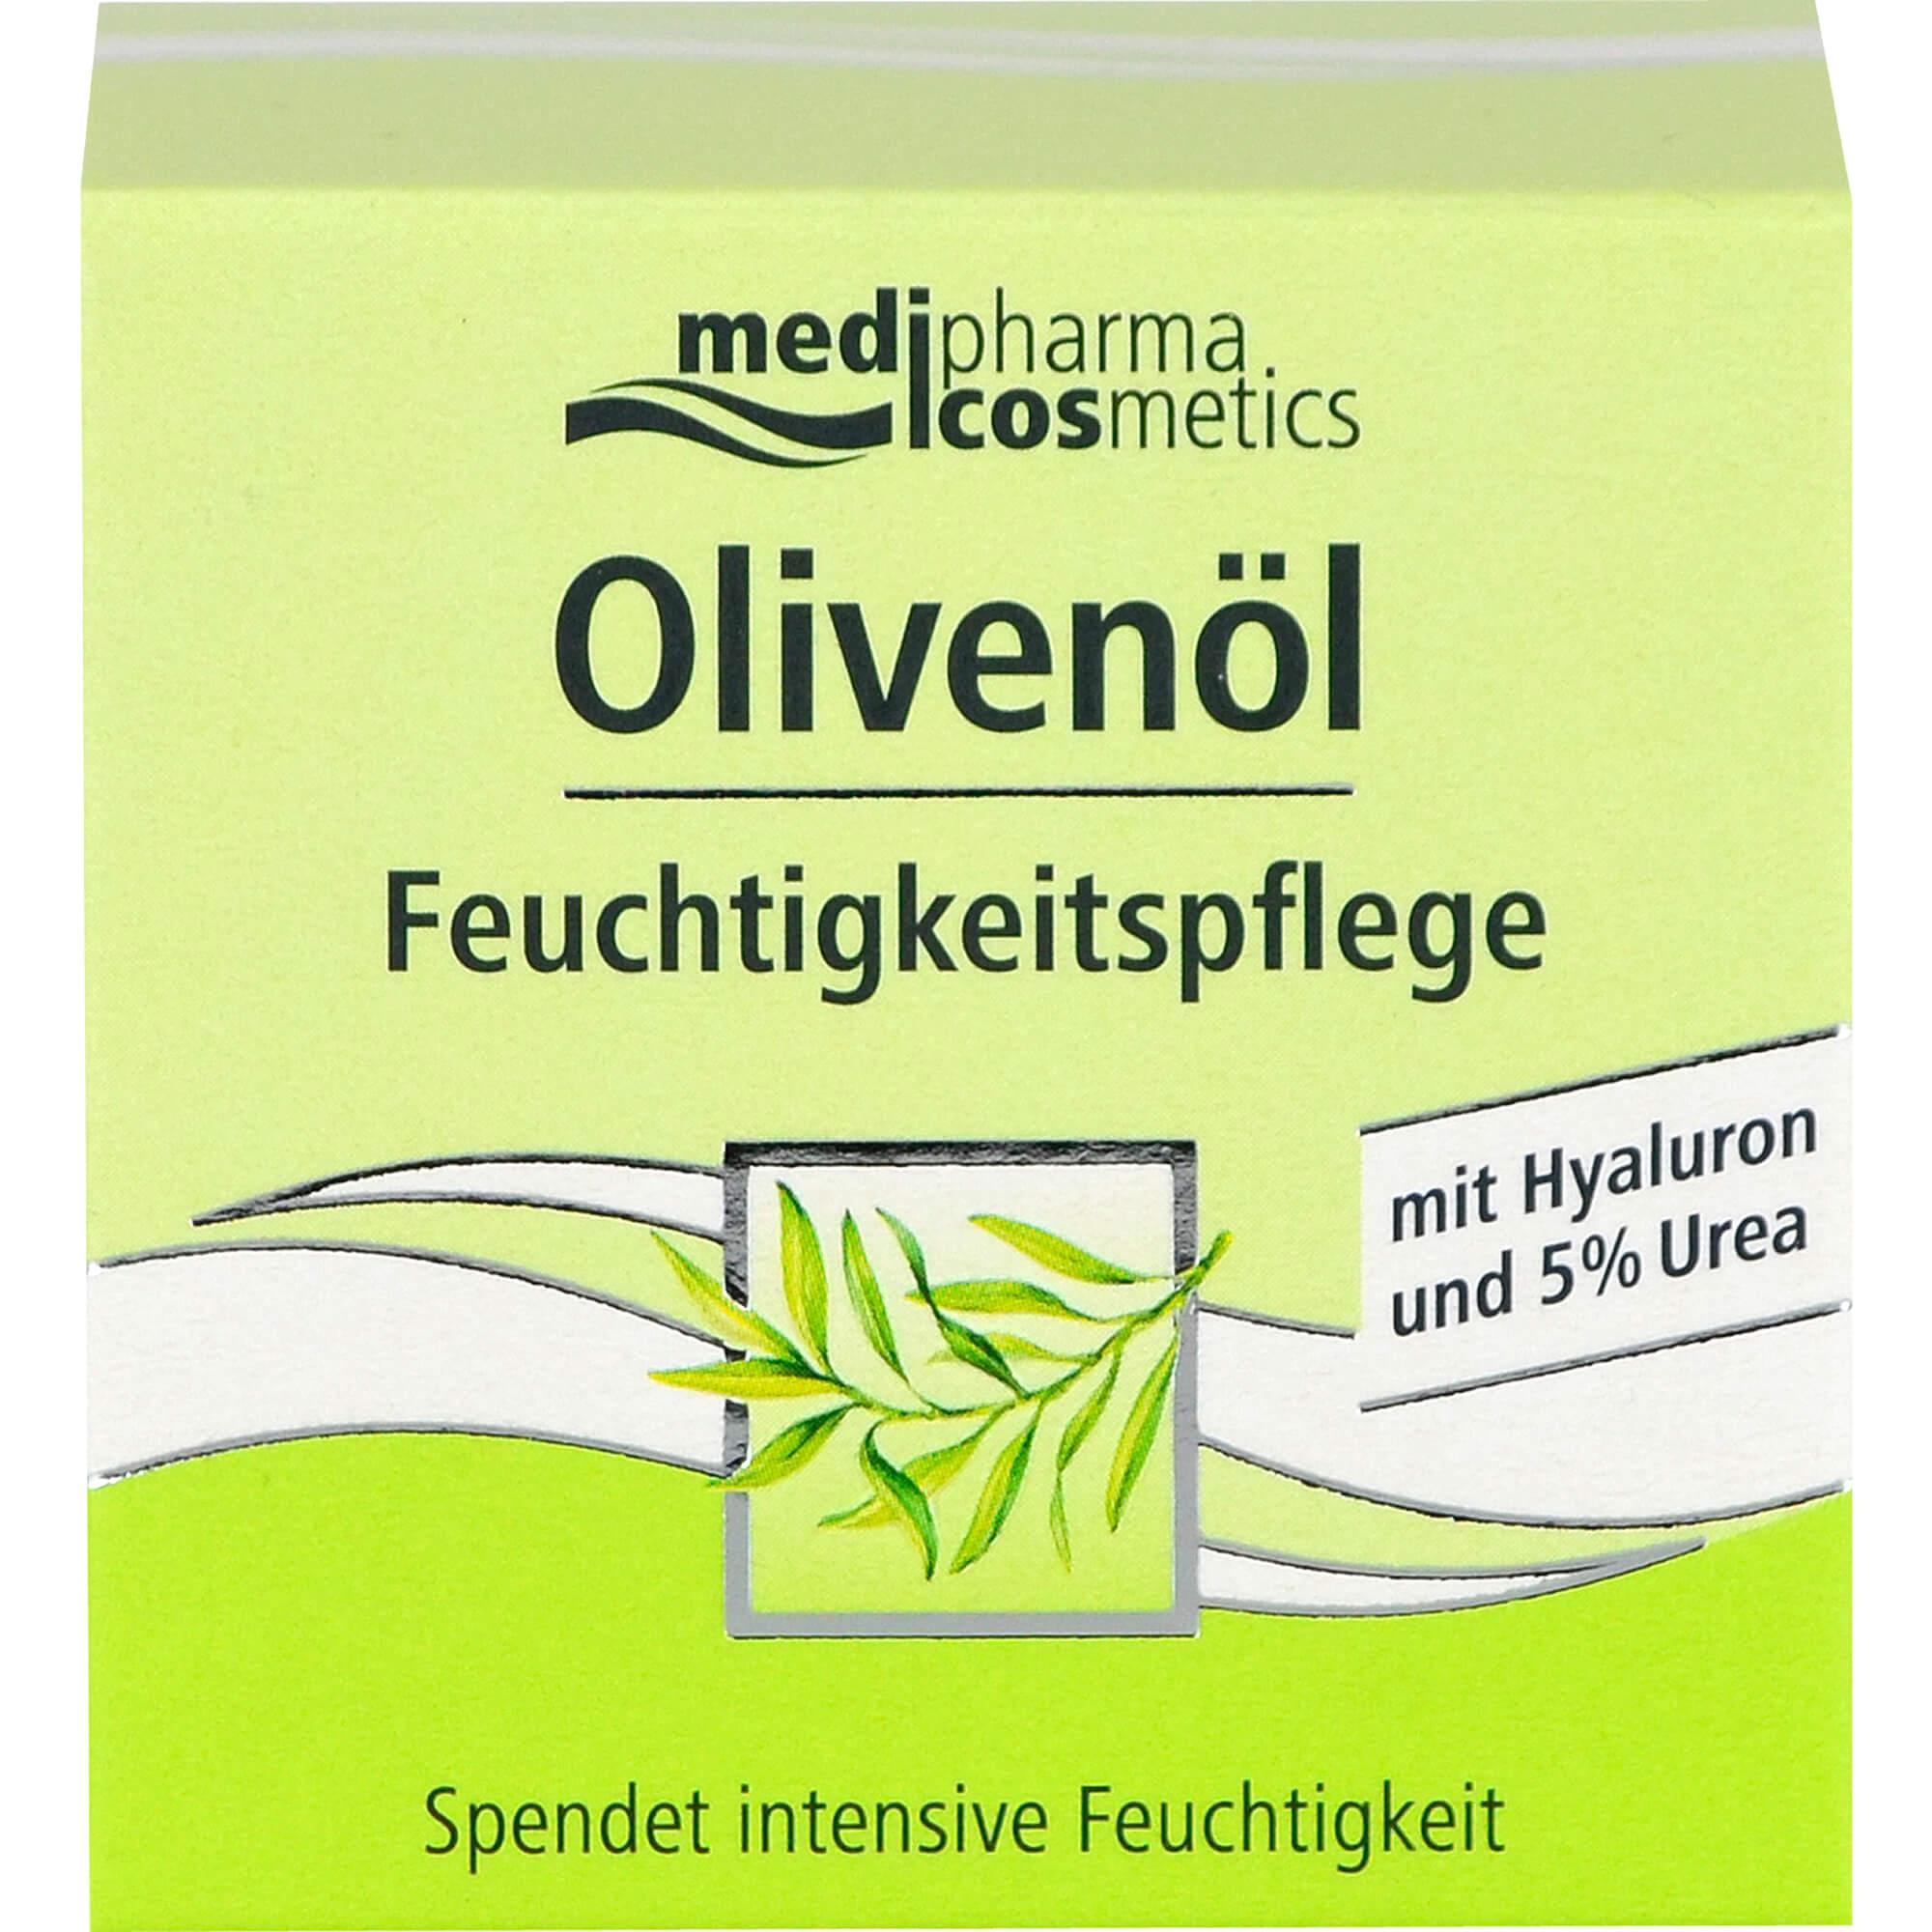 OLIVENOeL-FEUCHTIGKEITSPFLEGE-Creme